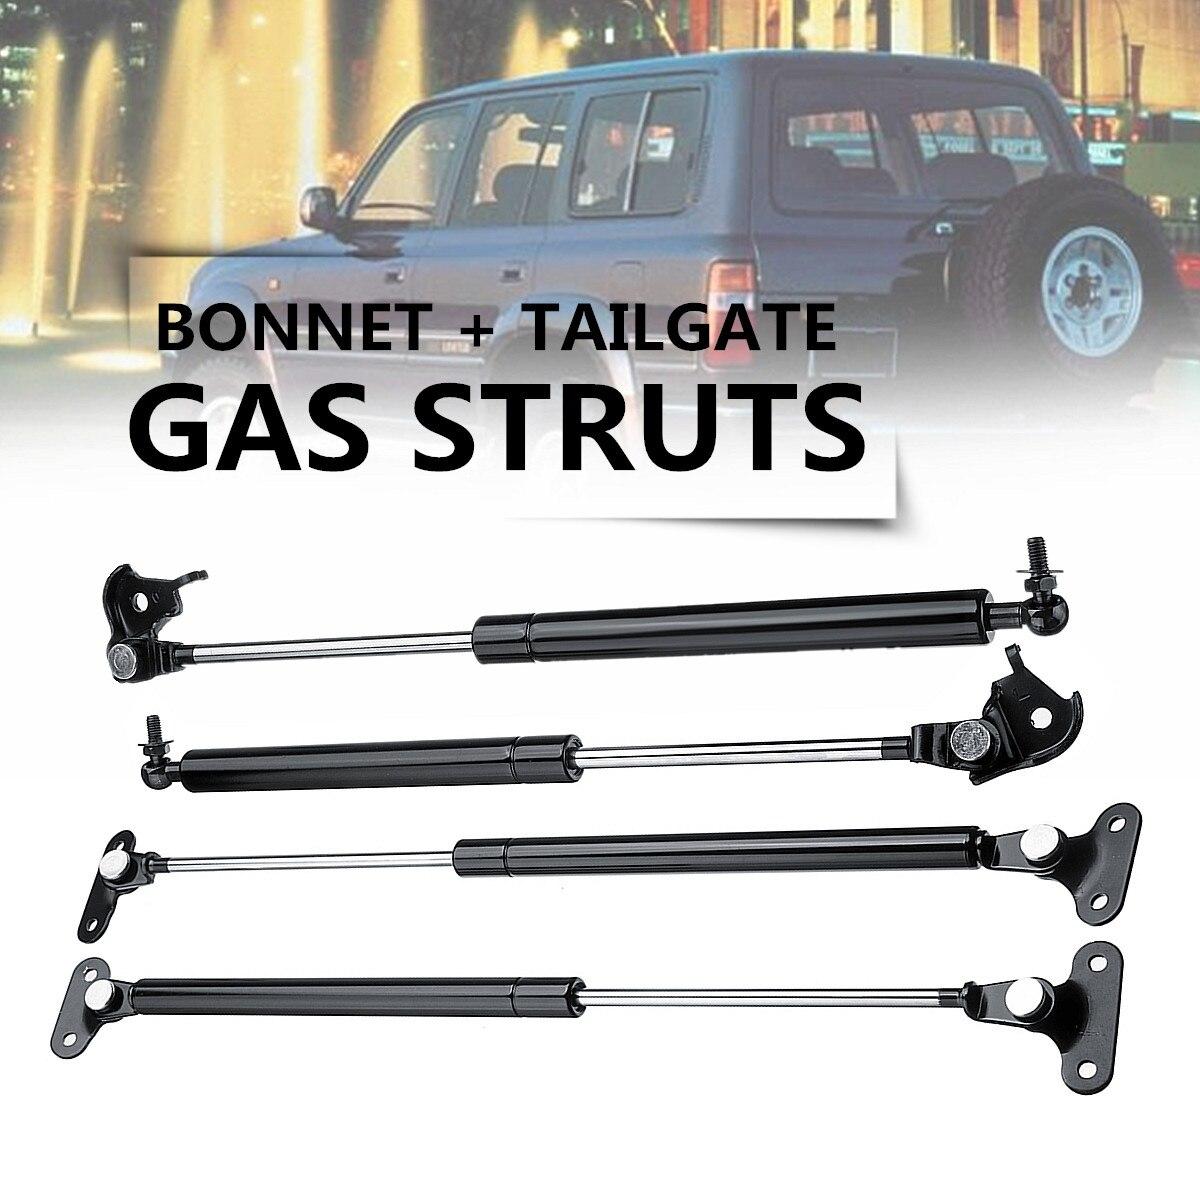 US $15 59 42% OFF 2Pair Bonnet+Tailgate Gas Struts Lift for Toyota Land  Cruiser 80 Series 90 97 Steel Front Bonnet Length 47cm Tailgate 53cm-in  Strut